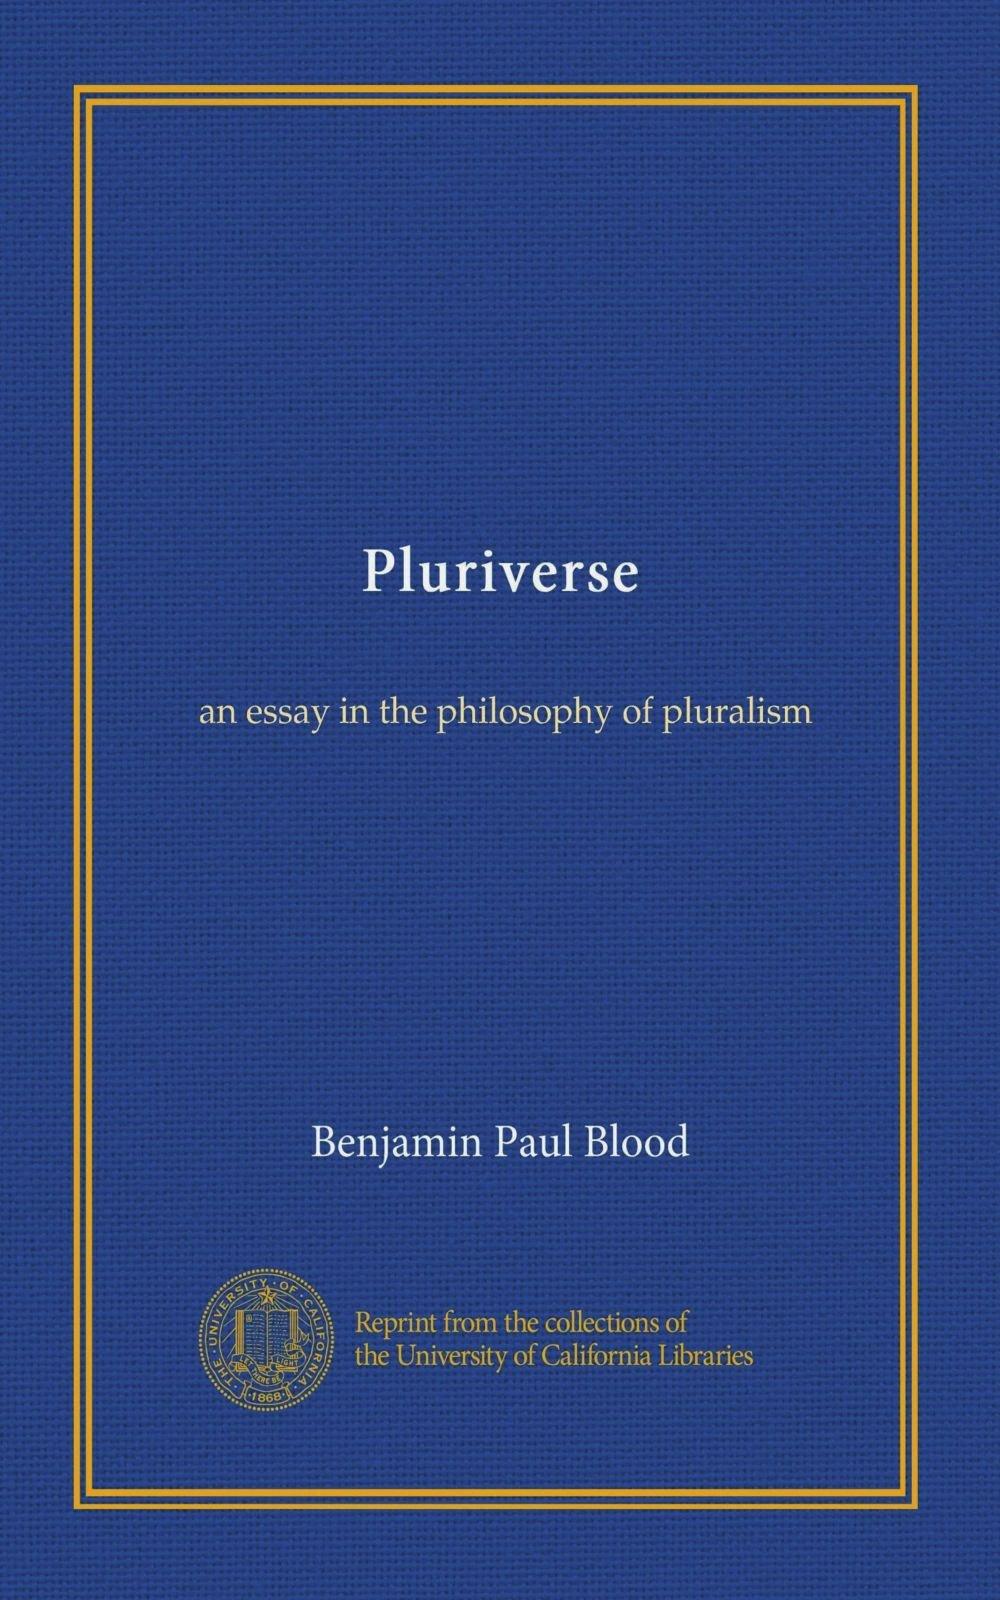 Pluriverse: an essay in the philosophy of pluralism: Benjamin Paul Blood:  Amazon.com: Books